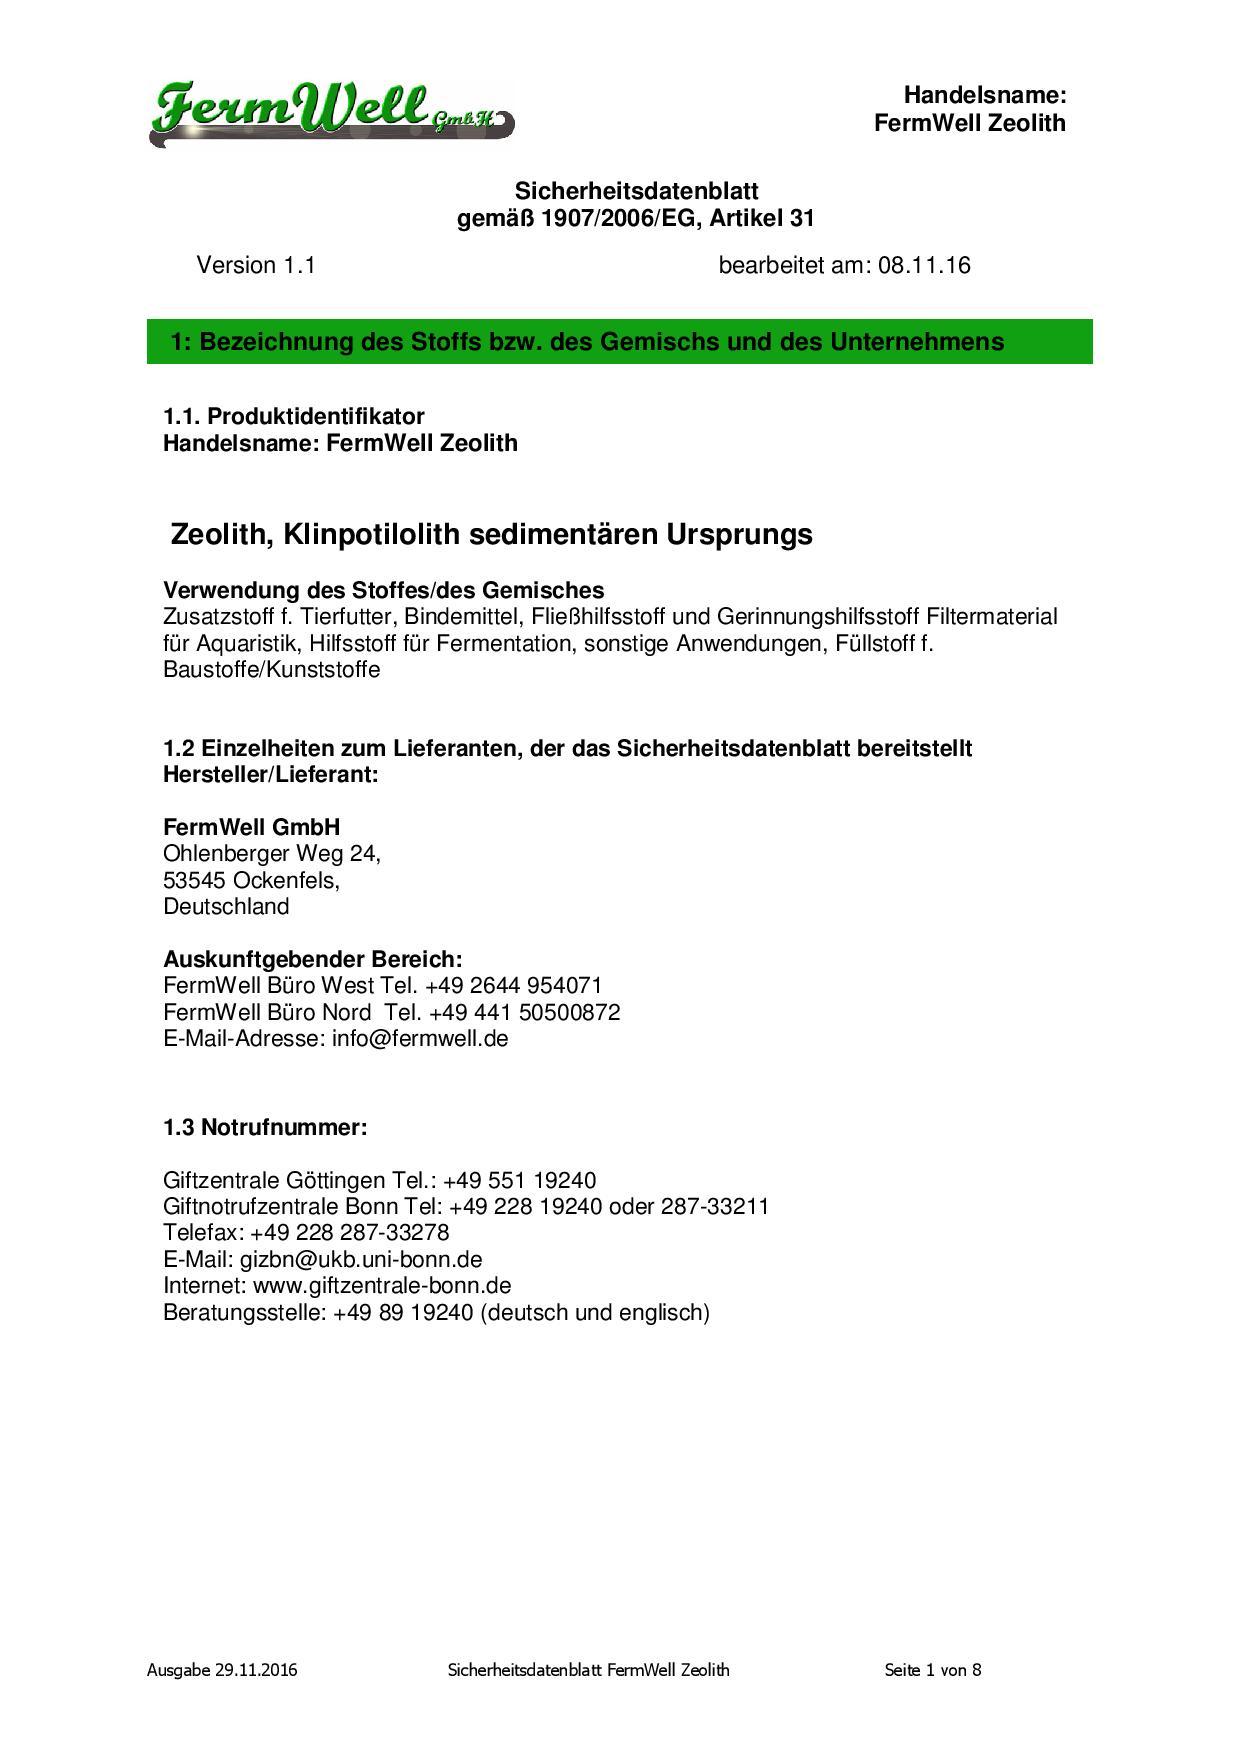 FWG_Zeolith_Sicherheitsdb_161129-page-00